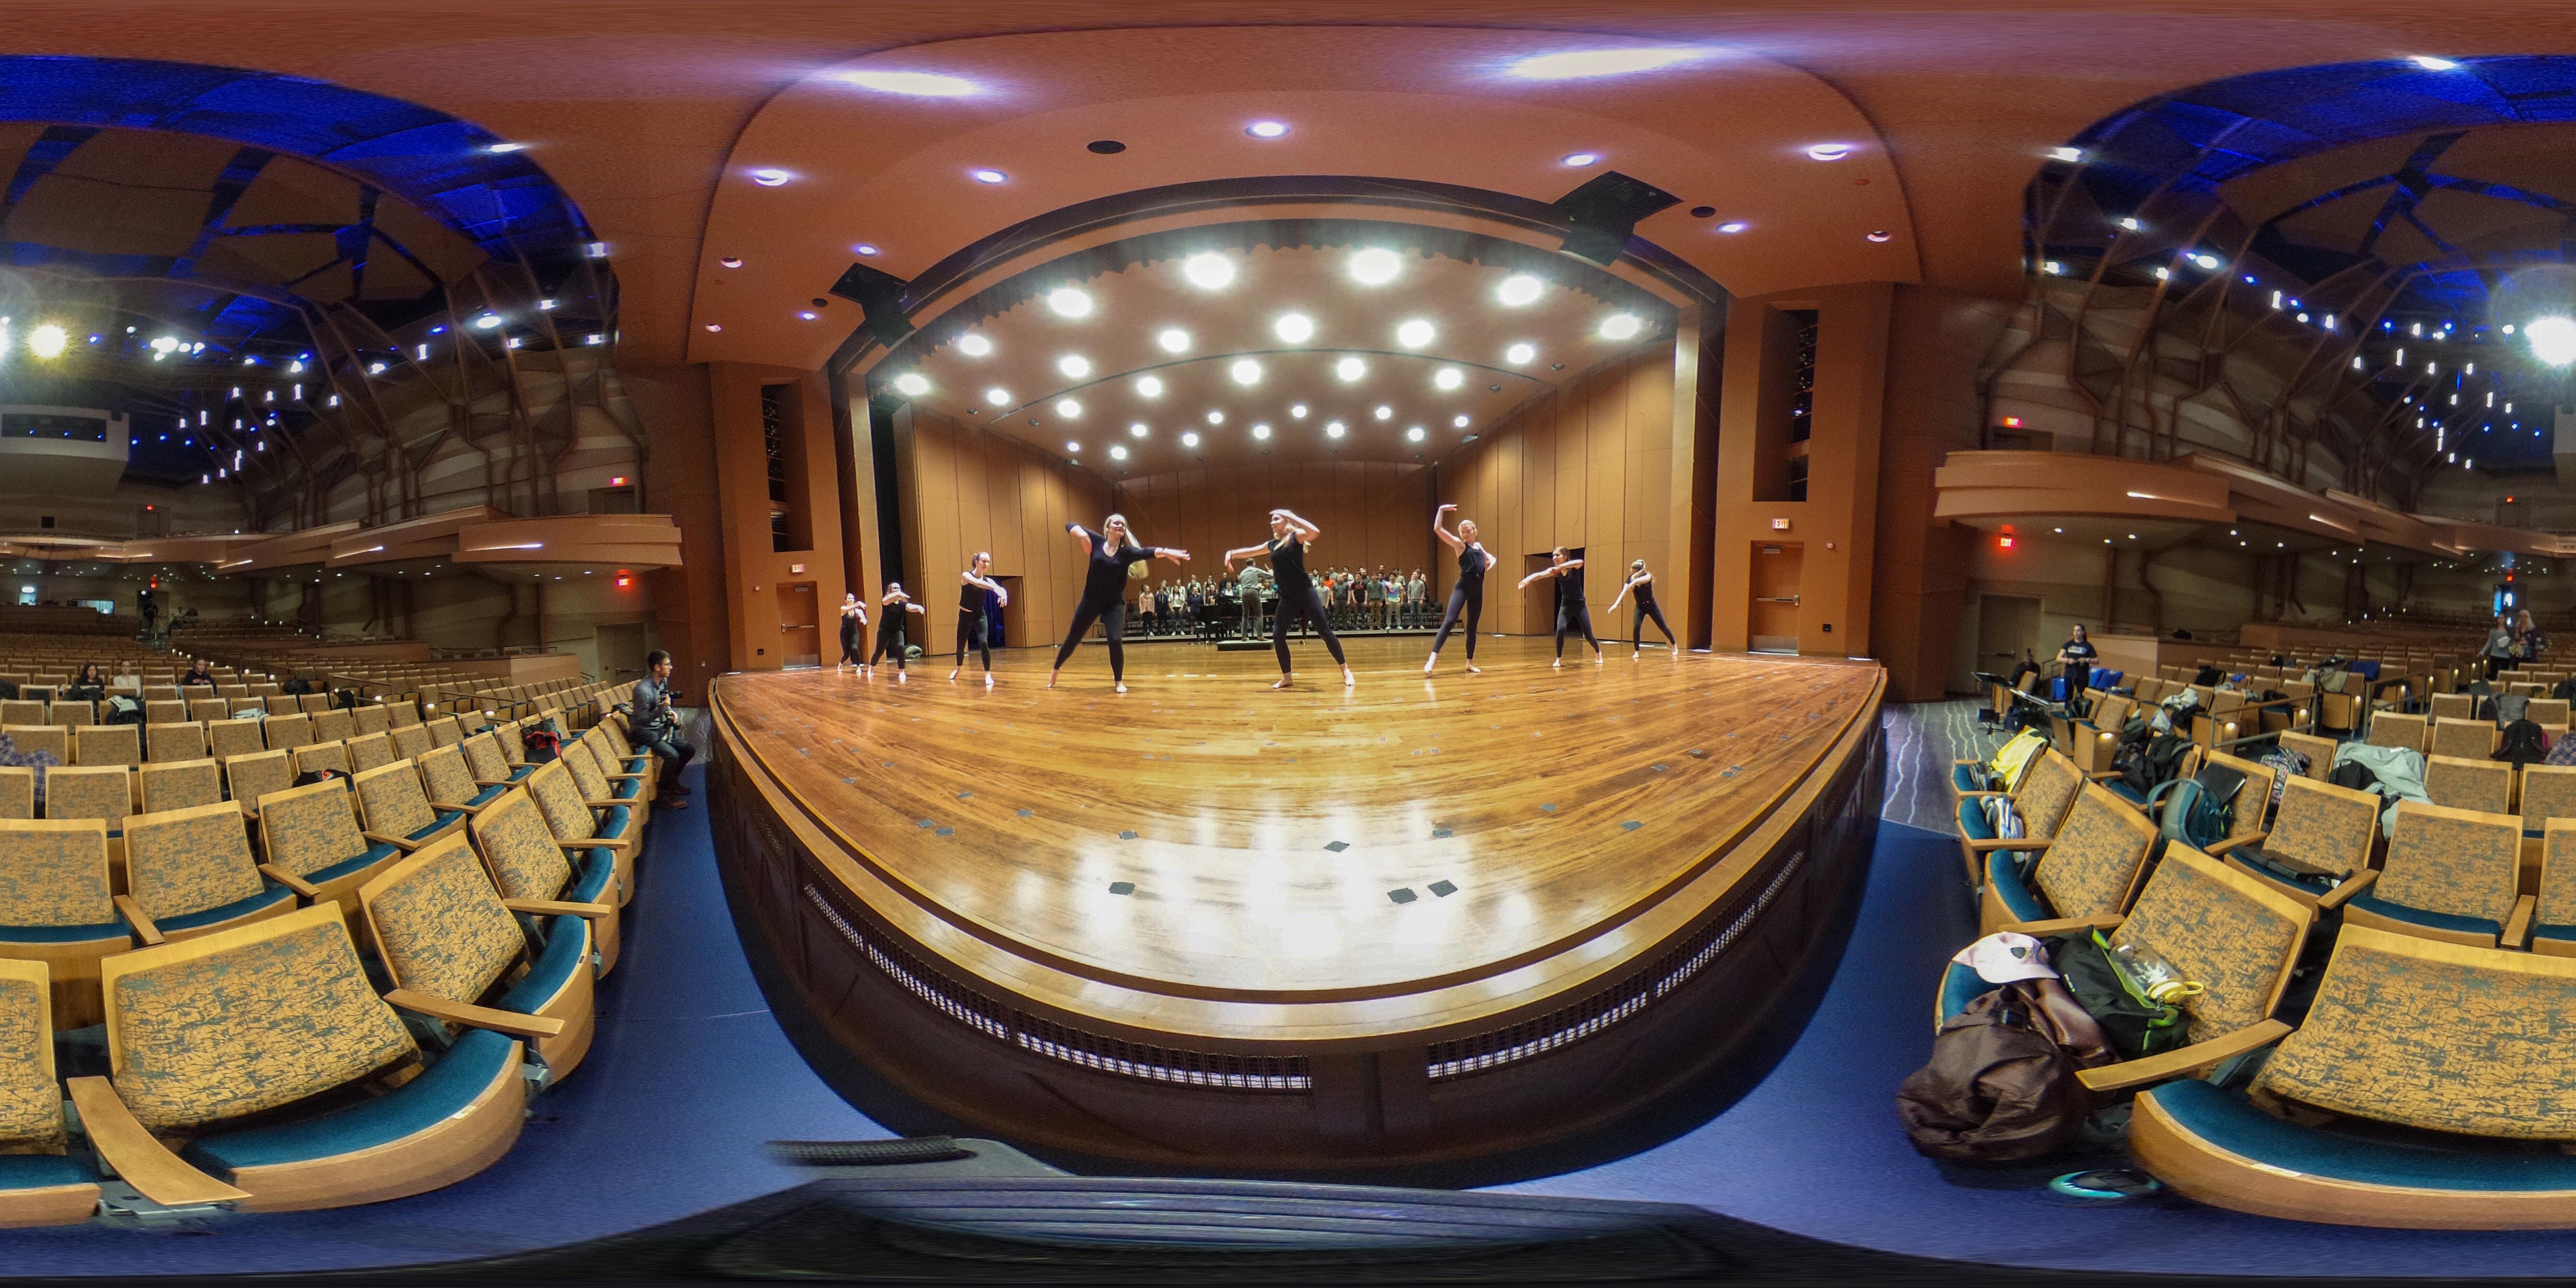 Gonzaga's Woldson Center auditorium